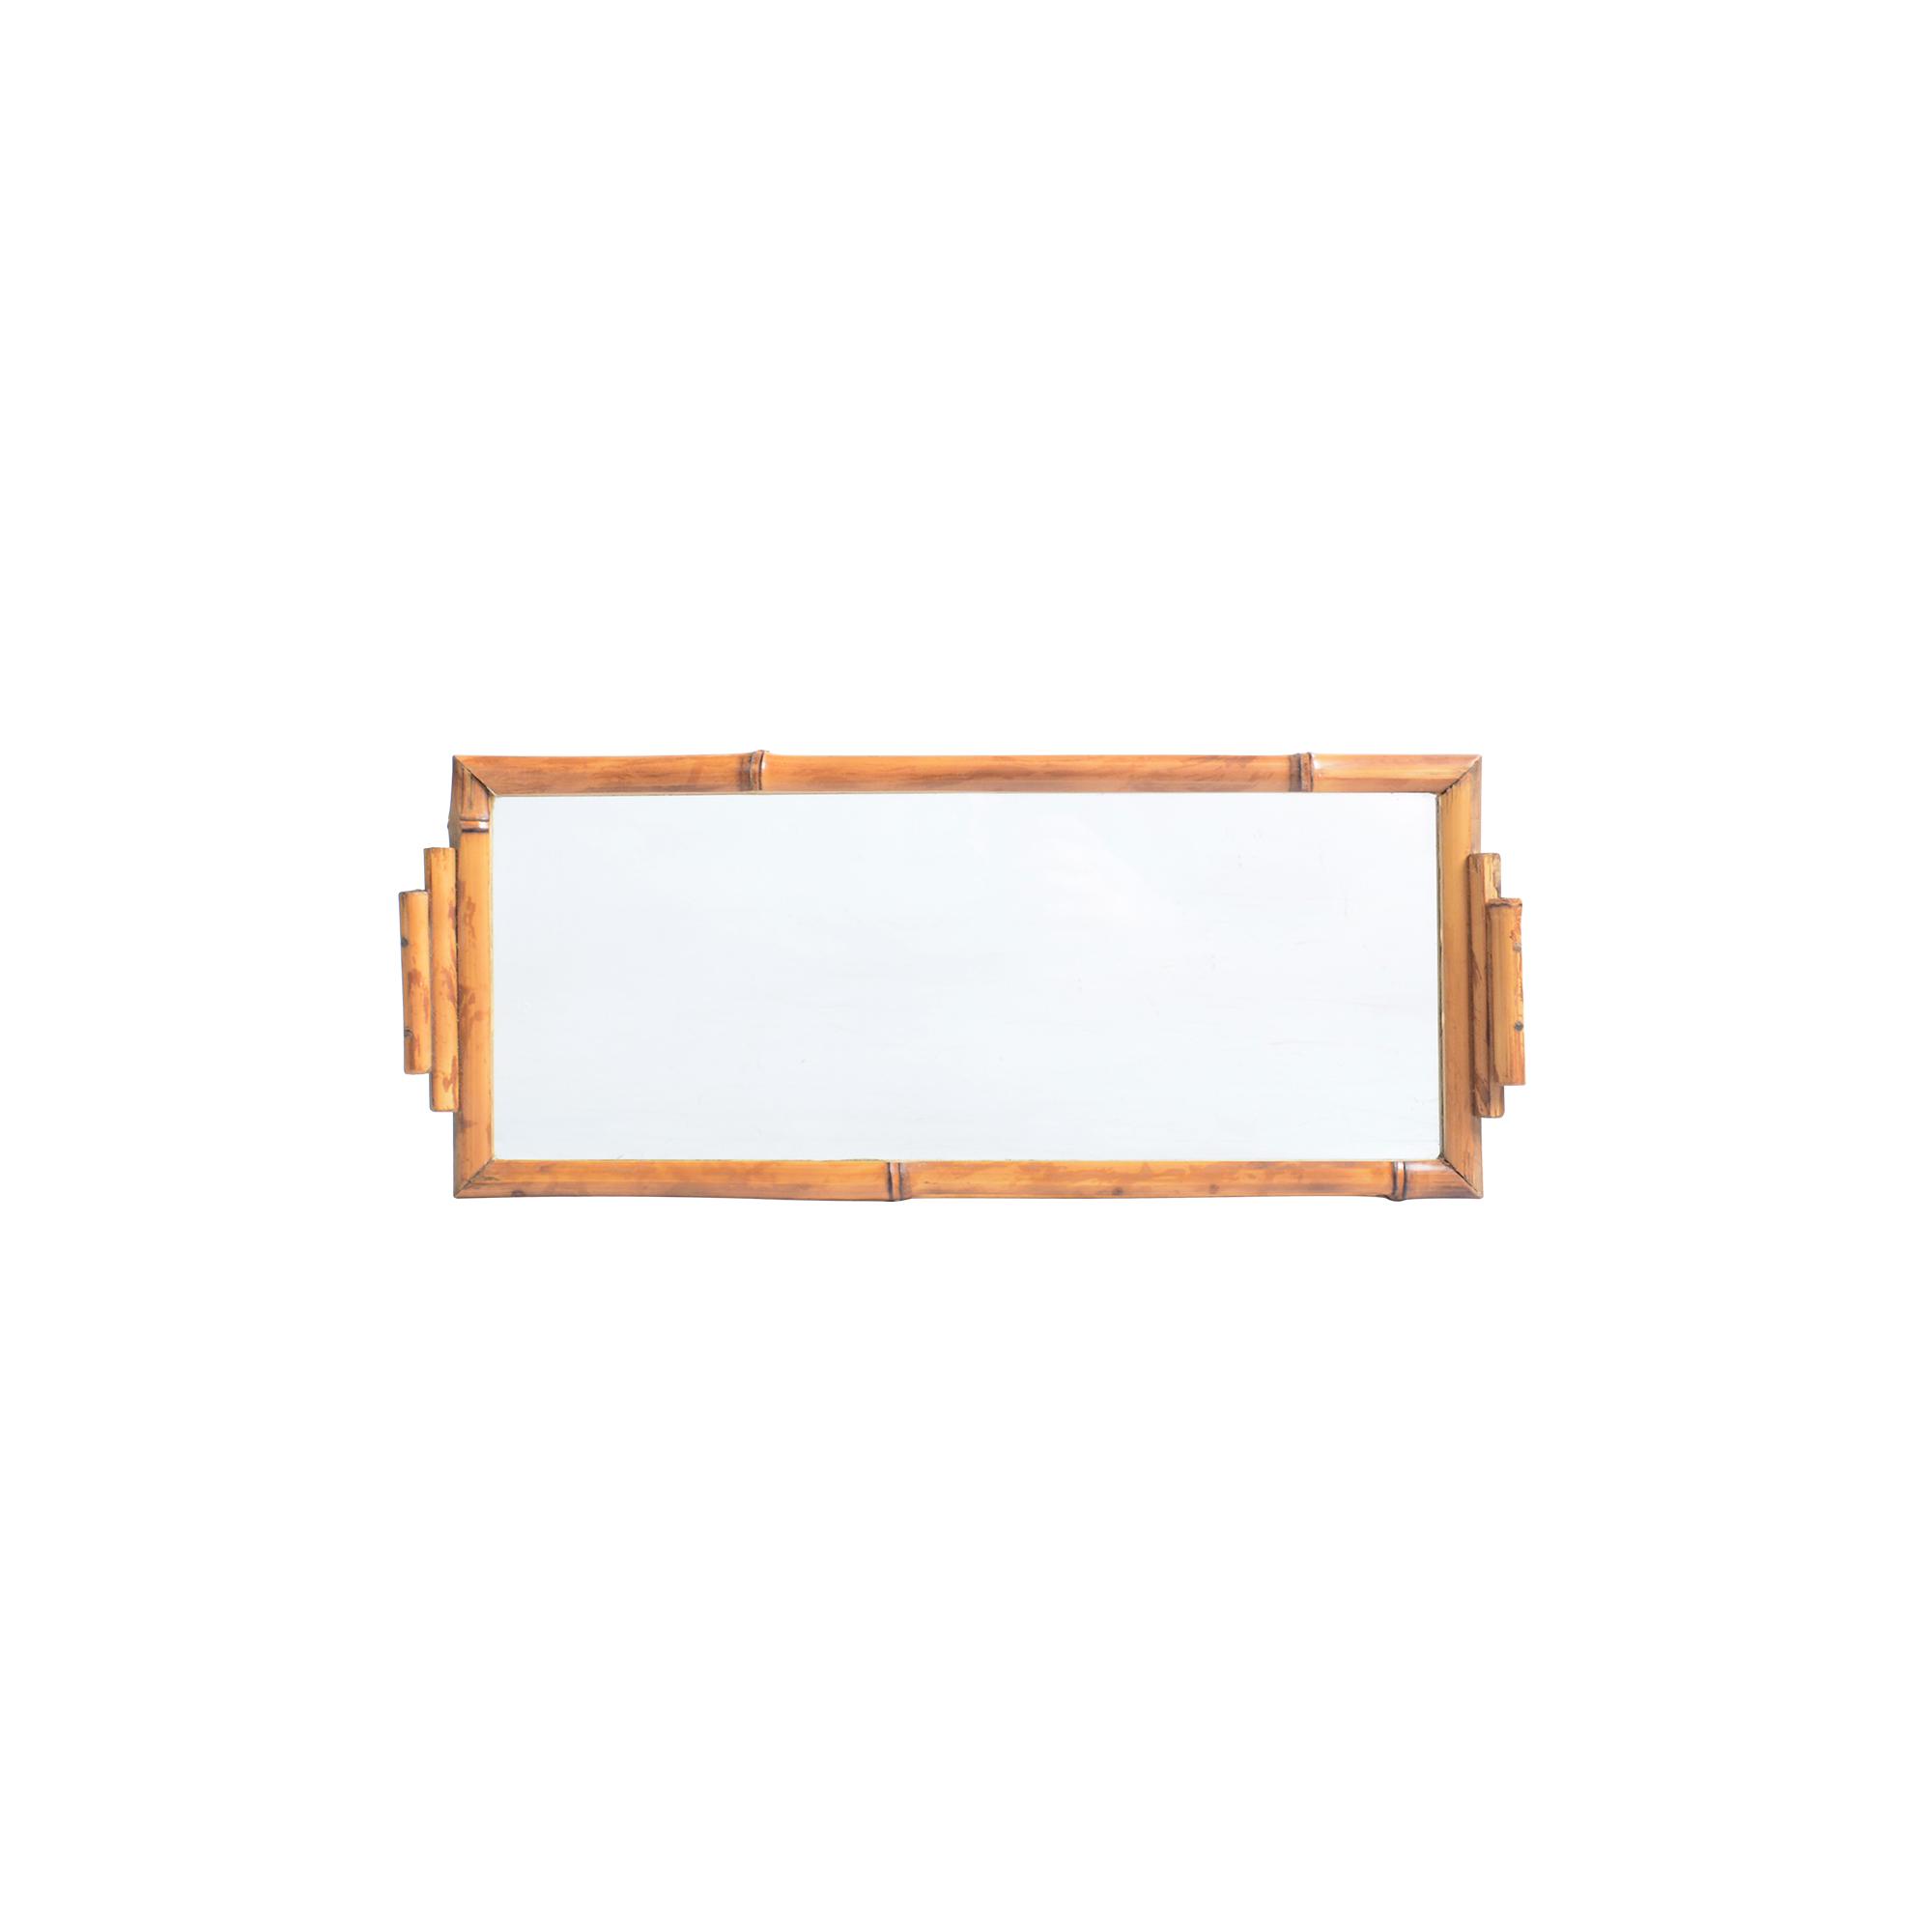 Bandeja de bambu com vidro retangular P lisa